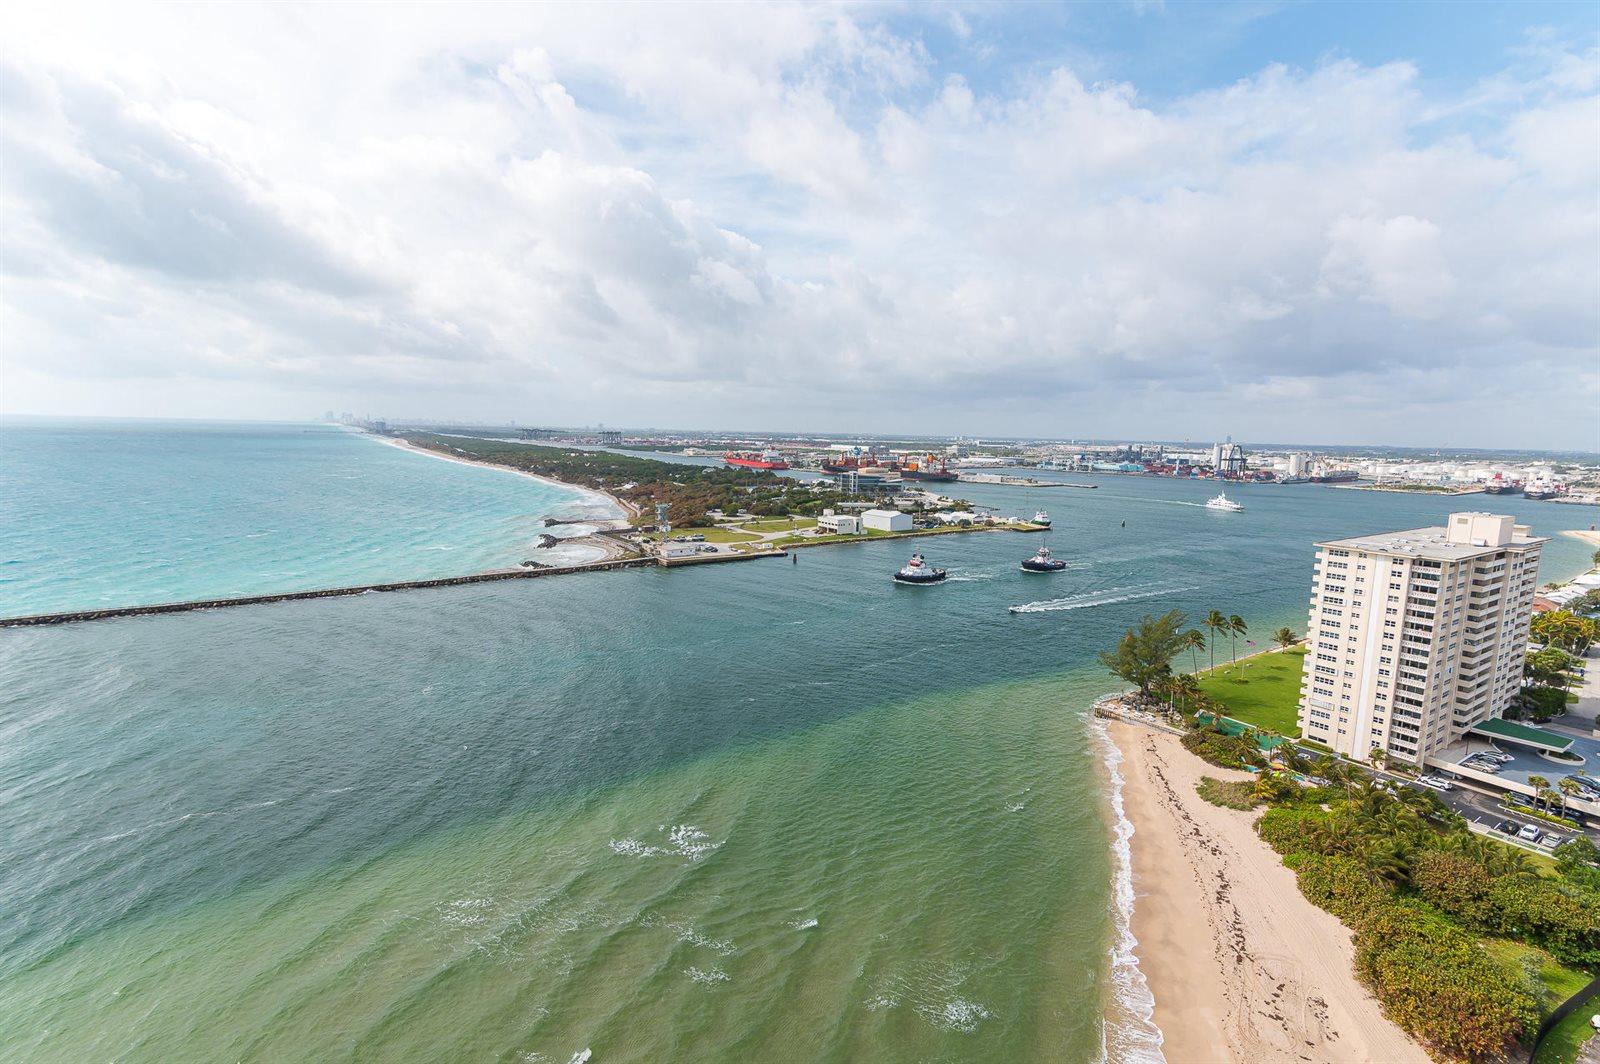 2200 South Ocean Lane, #2504, Fort Lauderdale, FL 33316